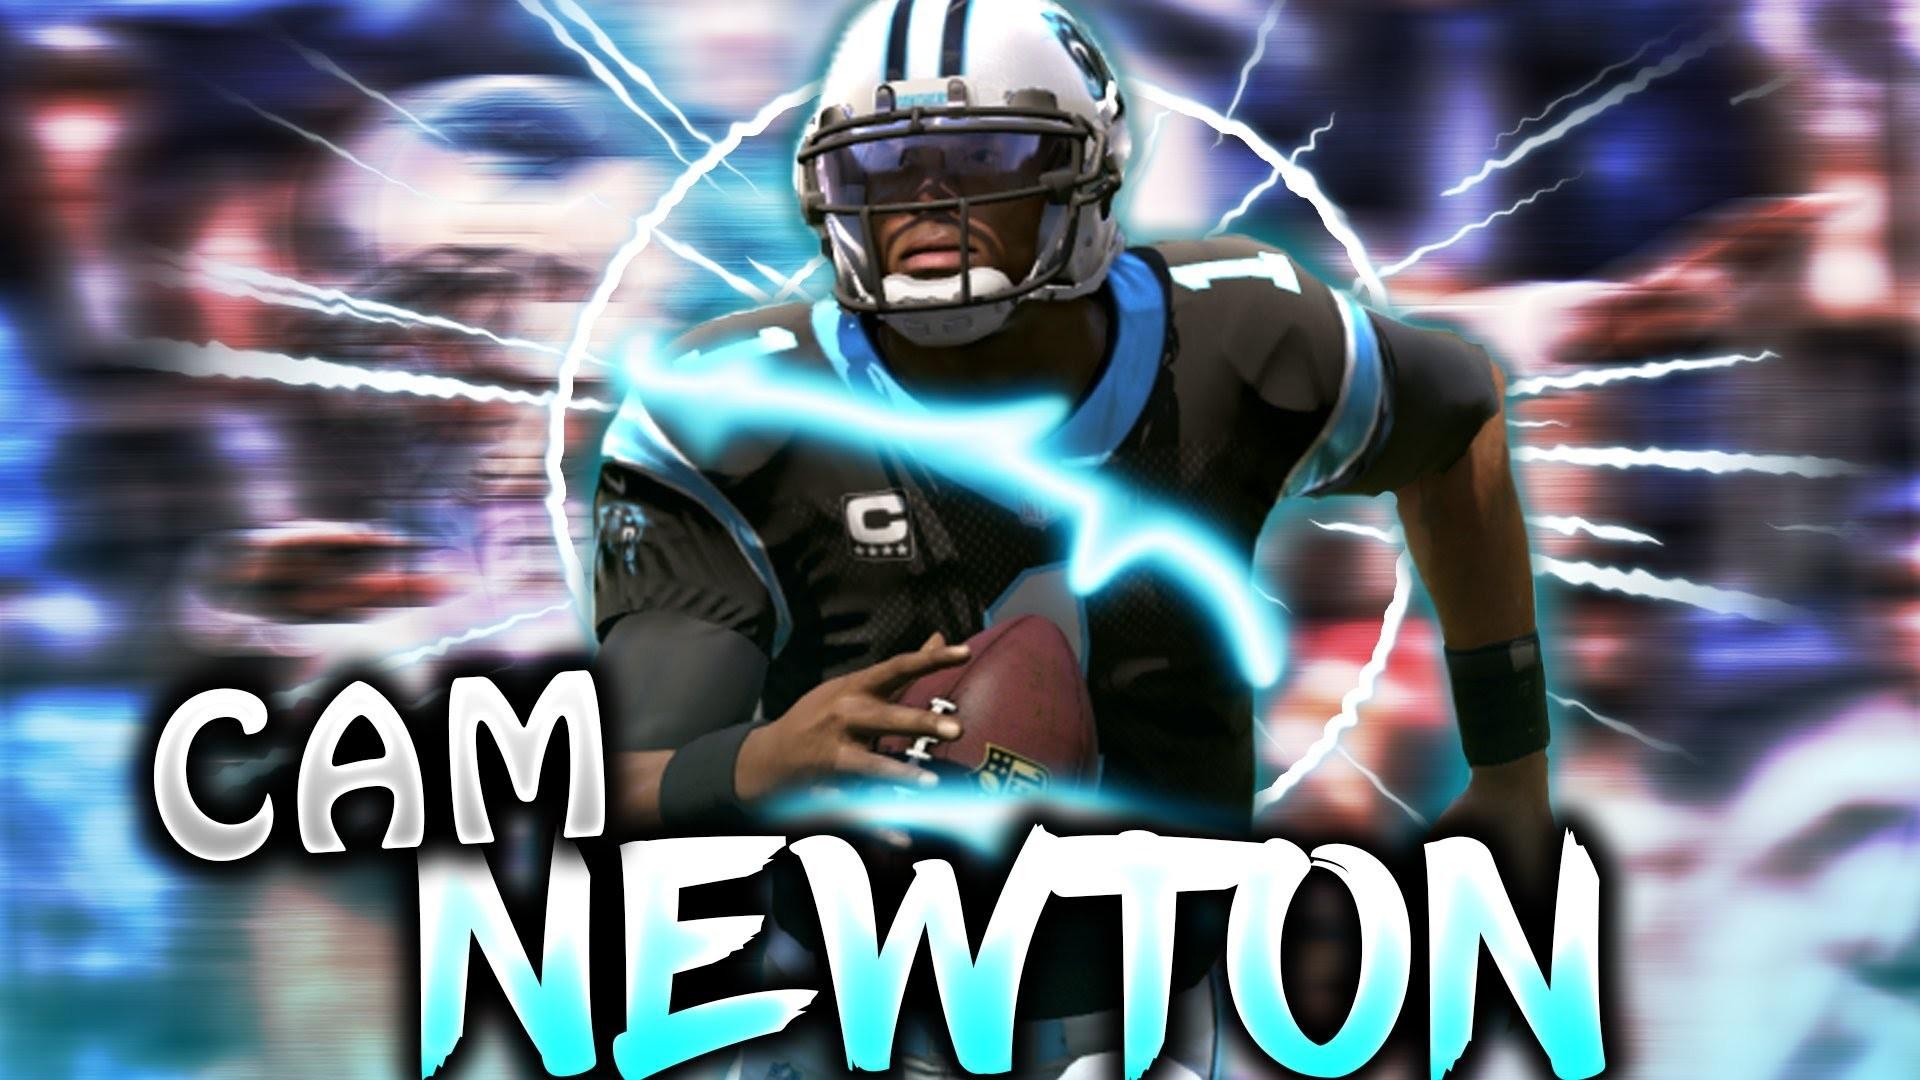 CAM NEWTON DAB = CAM NEWTON FIGHT! CAM VS CAM! – MADDEN 17 ULTIMATE TEAM  GAMEPLAY #6 – YouTube